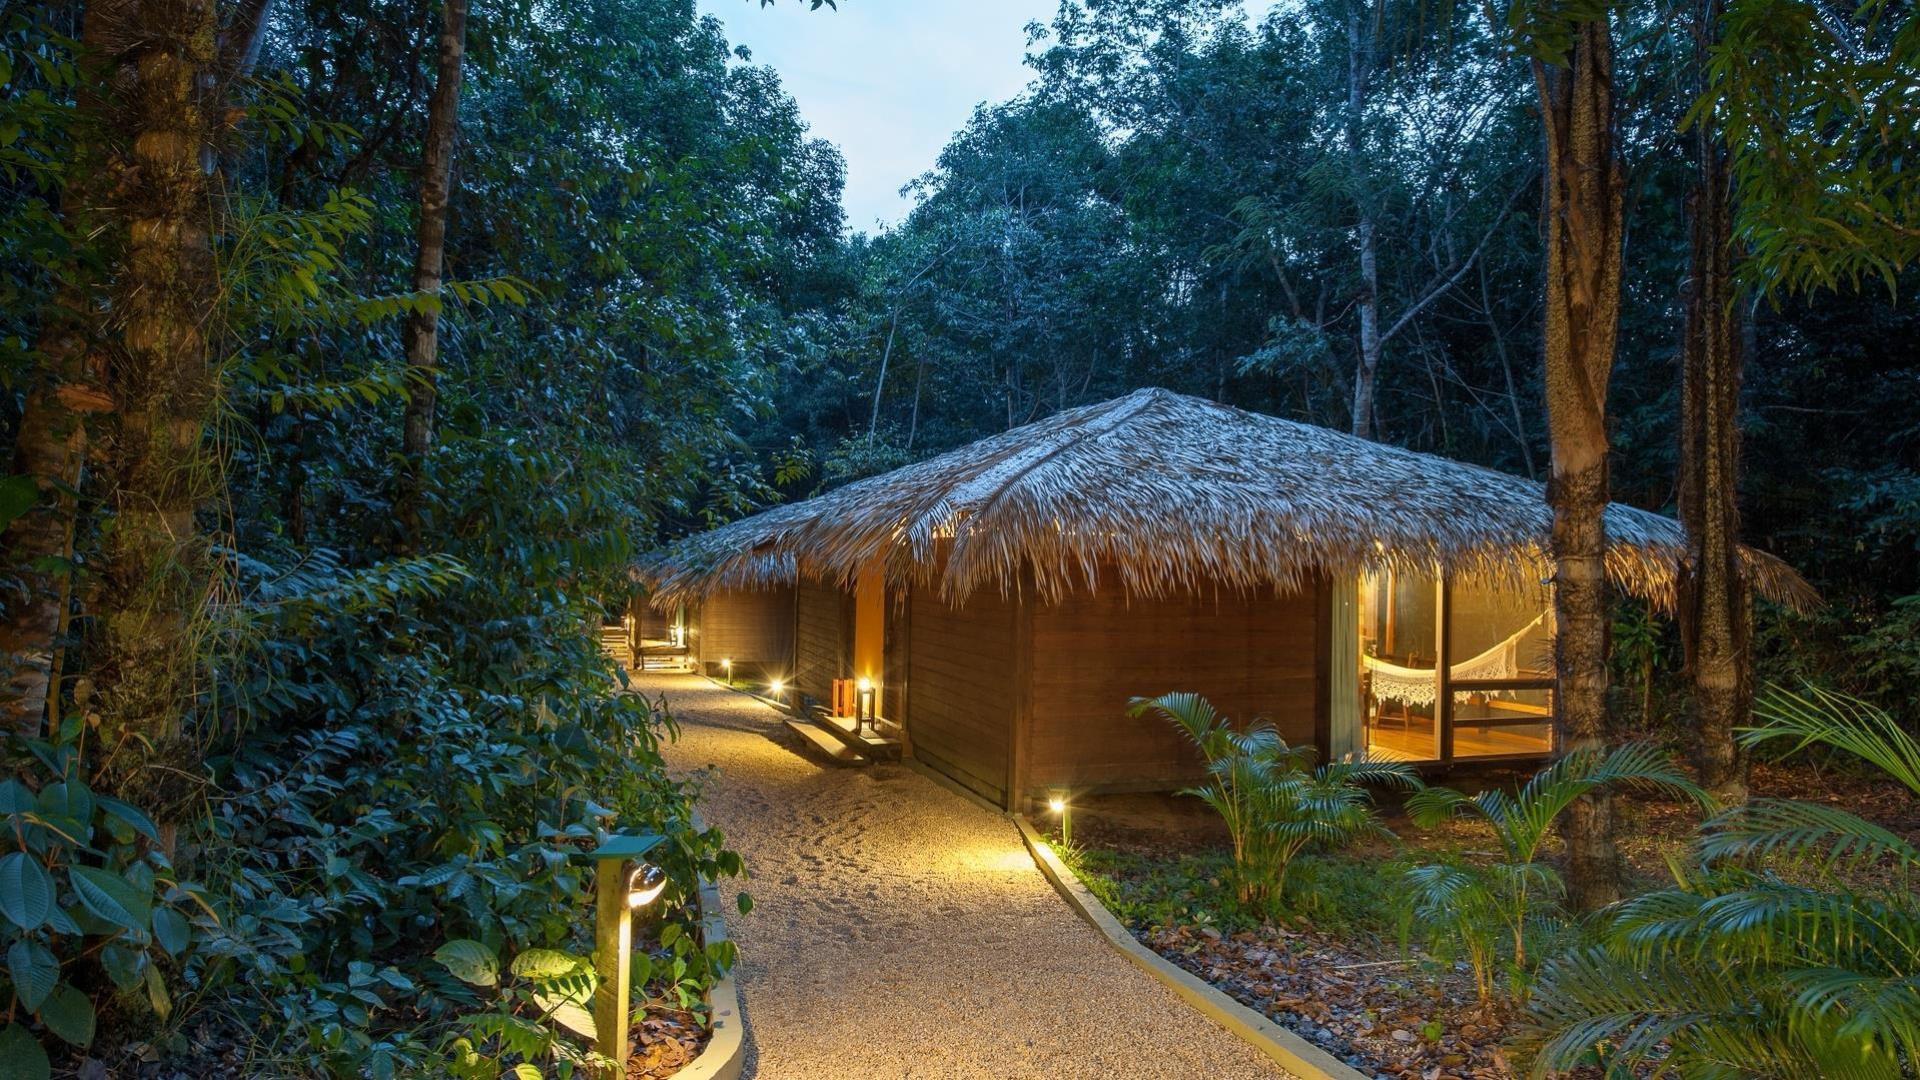 Brasilien Amazonas: 3 bis 6 Tage Reisebausteine - Anavilhanas Jungle Lodge